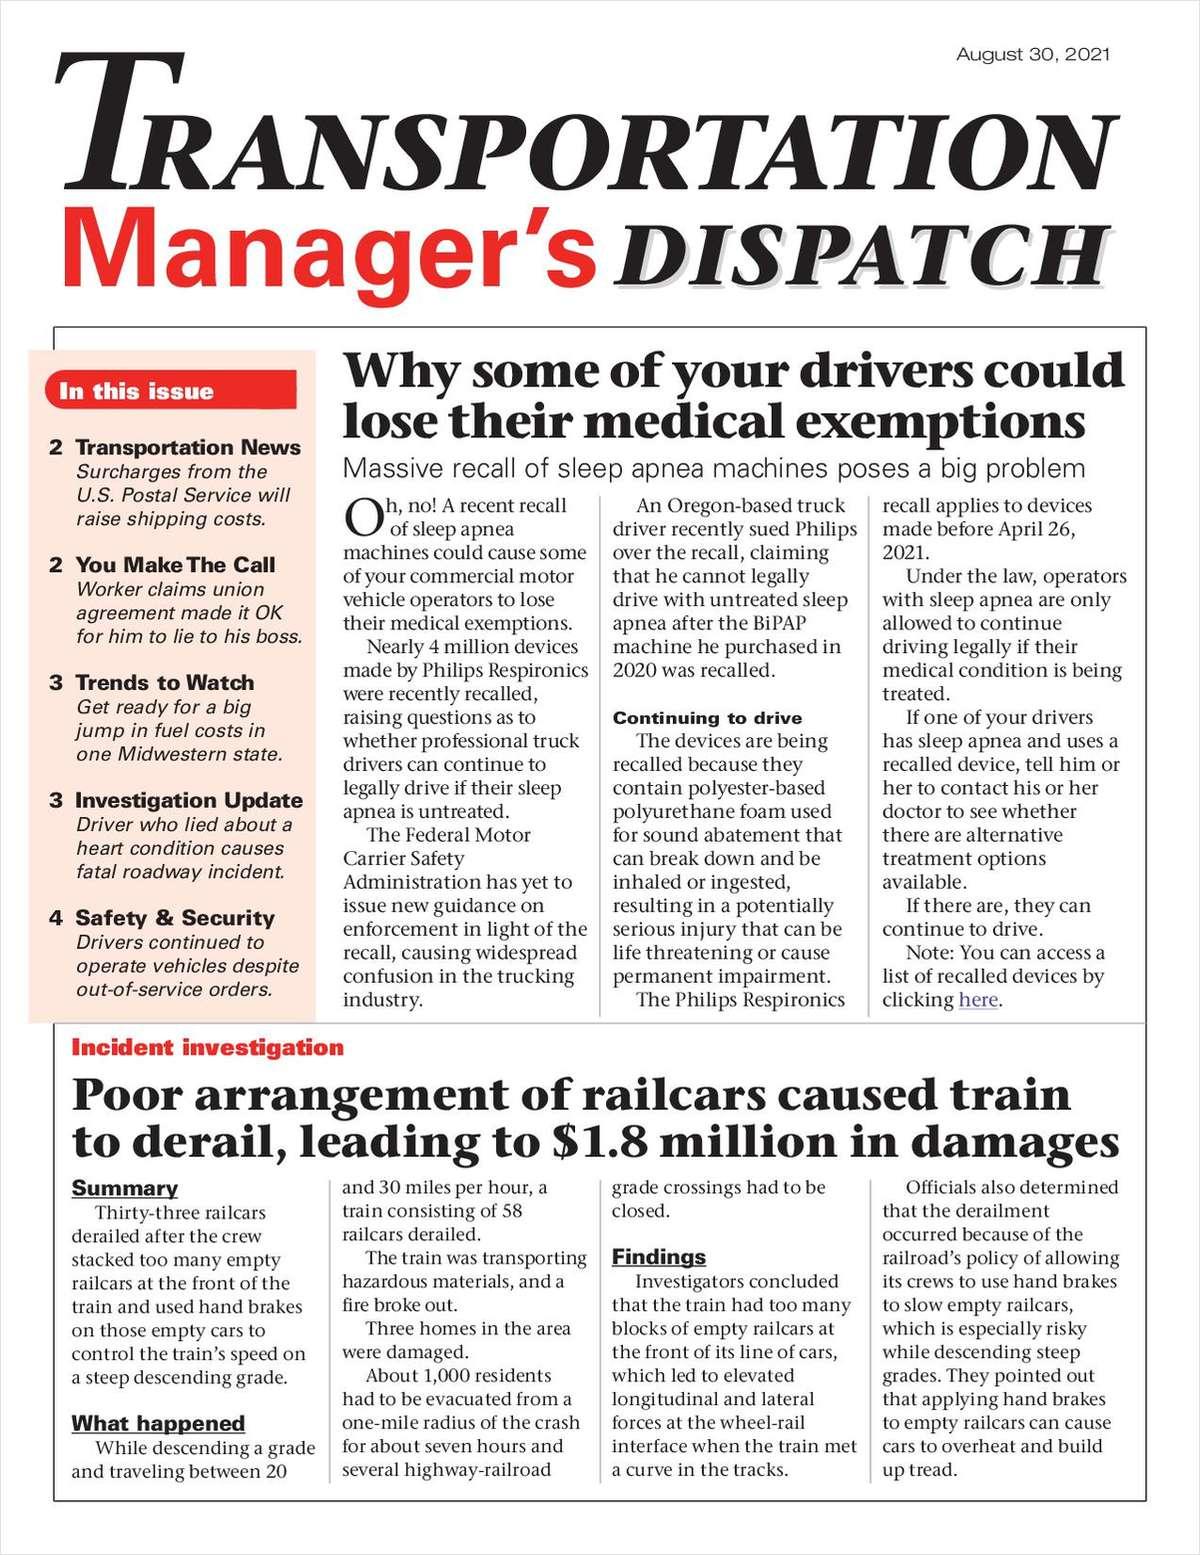 Transportation Manager's Dispatch Newsletter: September 13 Issue